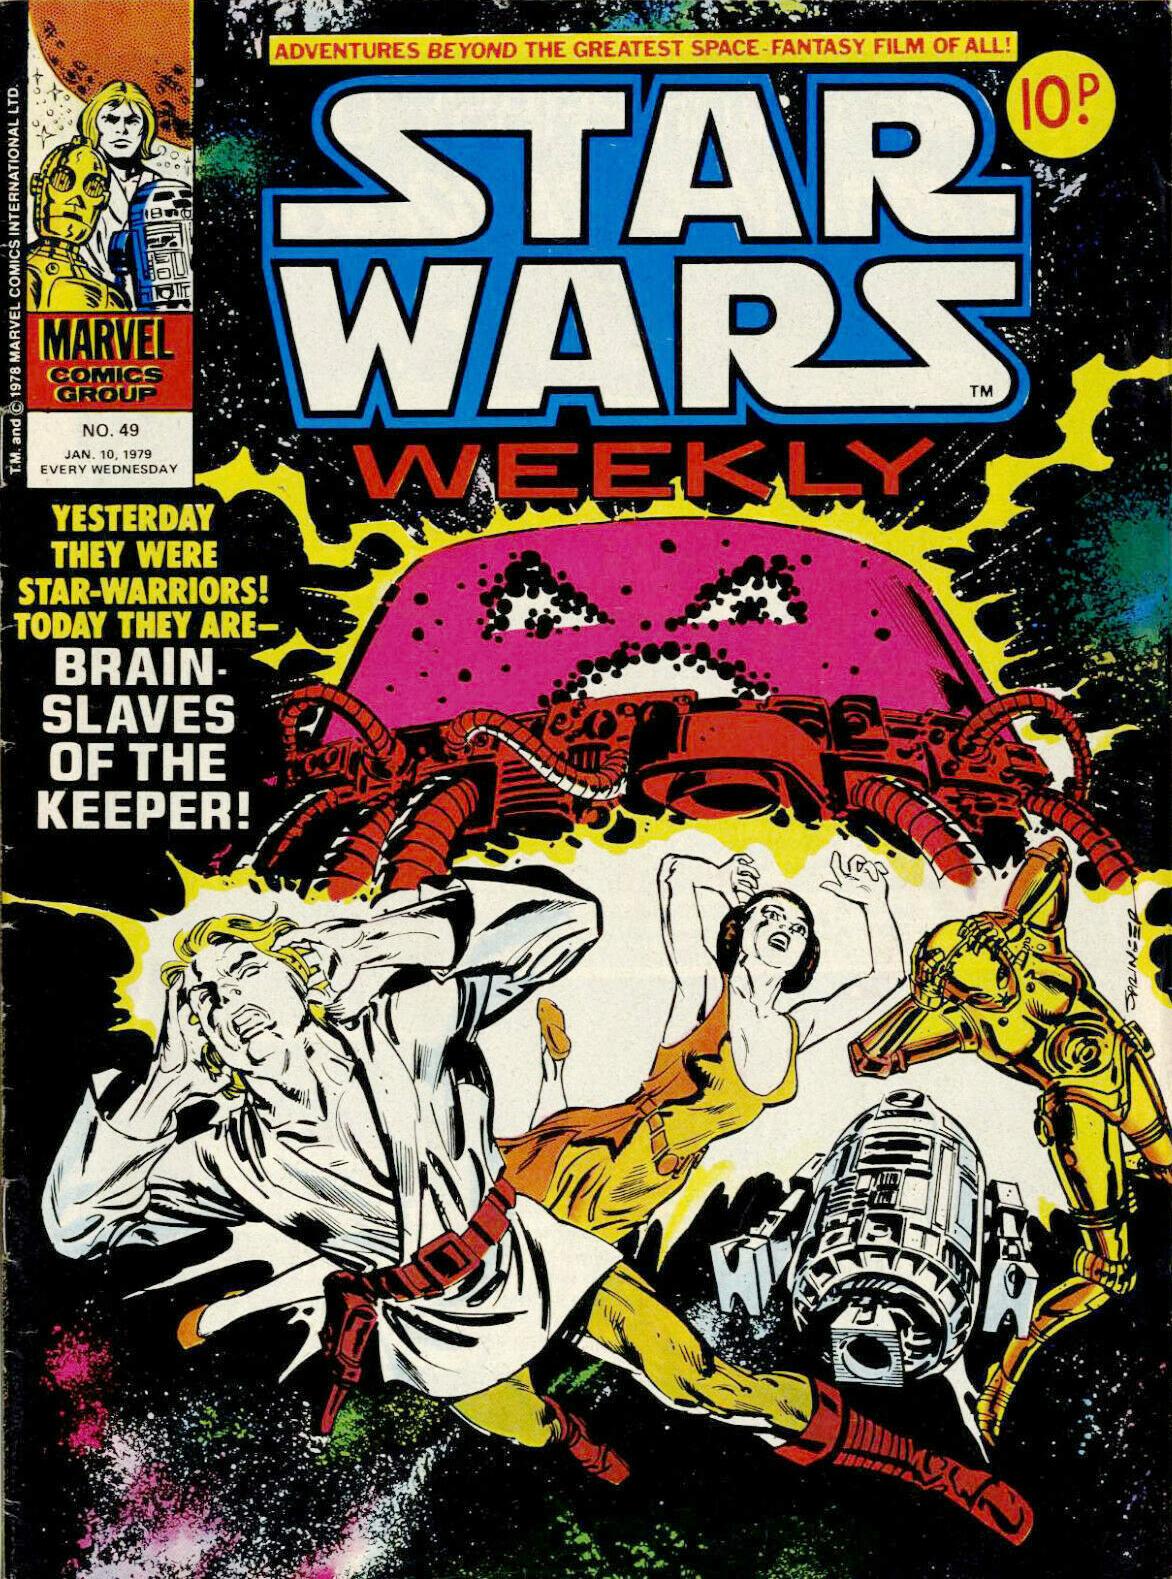 Star Wars Weekly 49